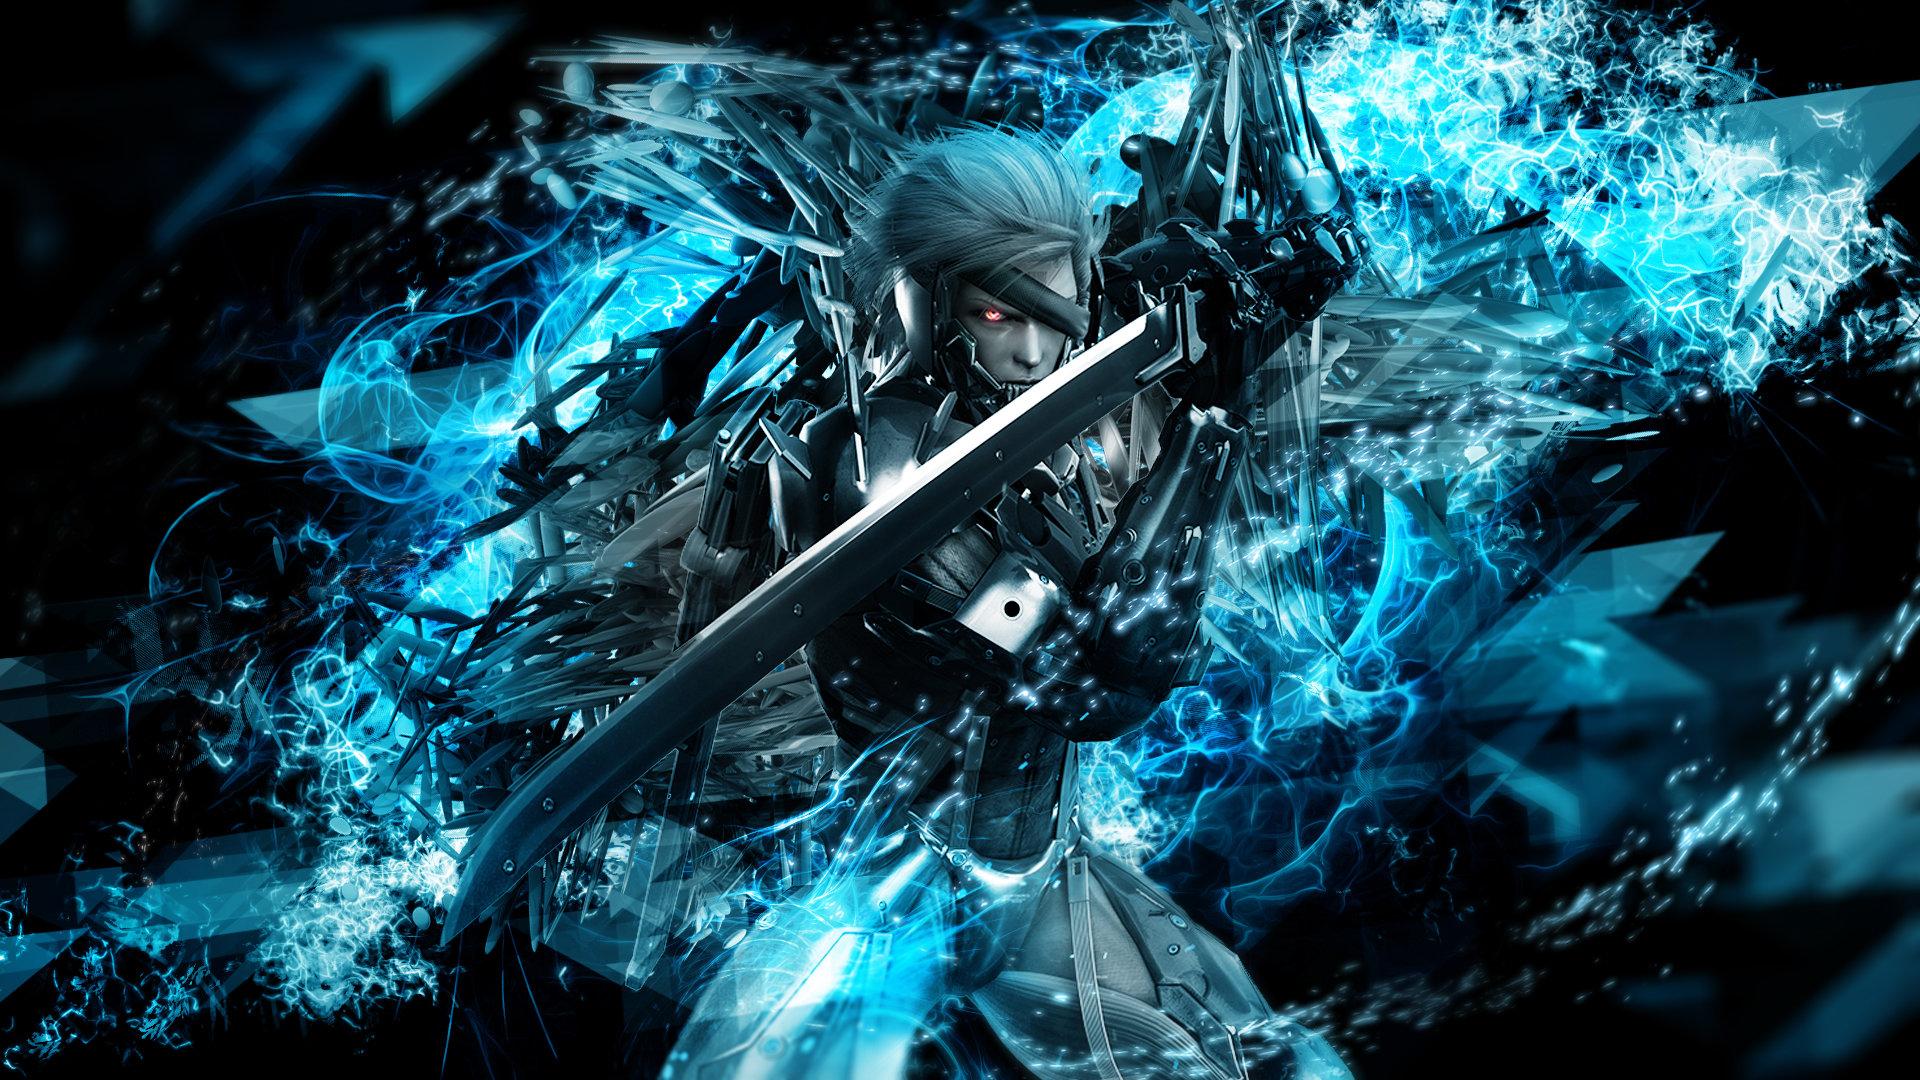 Metal Gear Rising Wallpaper A5 Hd Desktop Wallpapers 4k Hd